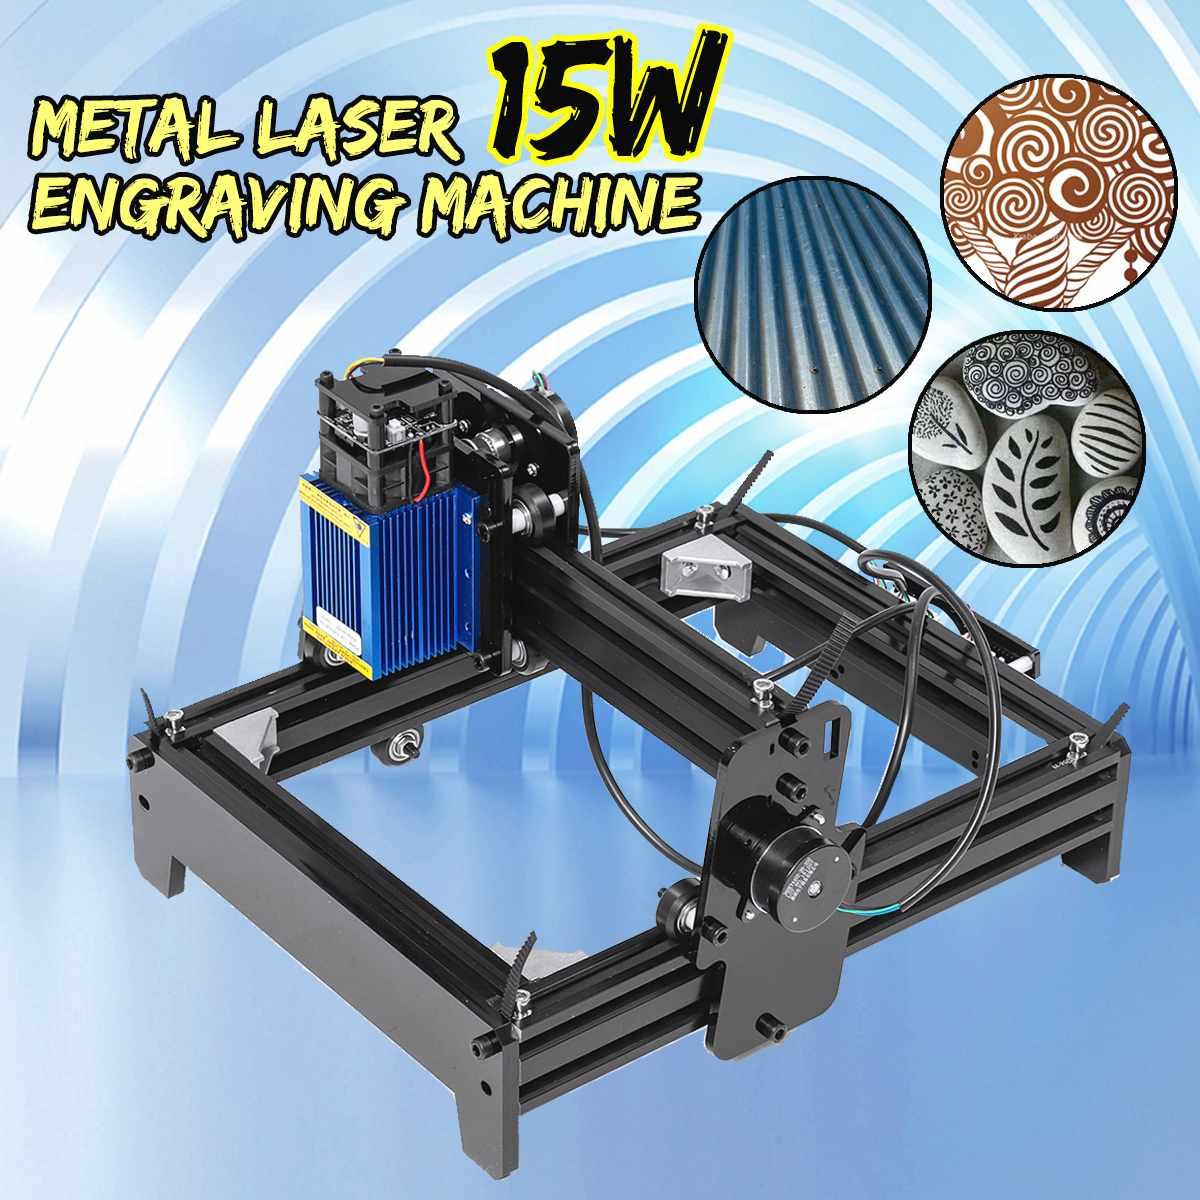 10W/12W/15W 15000mW High Precision Laser Engraving Machine Metal Wood Marking Engraving Home DIY Logo Printer Cutter Wood Router